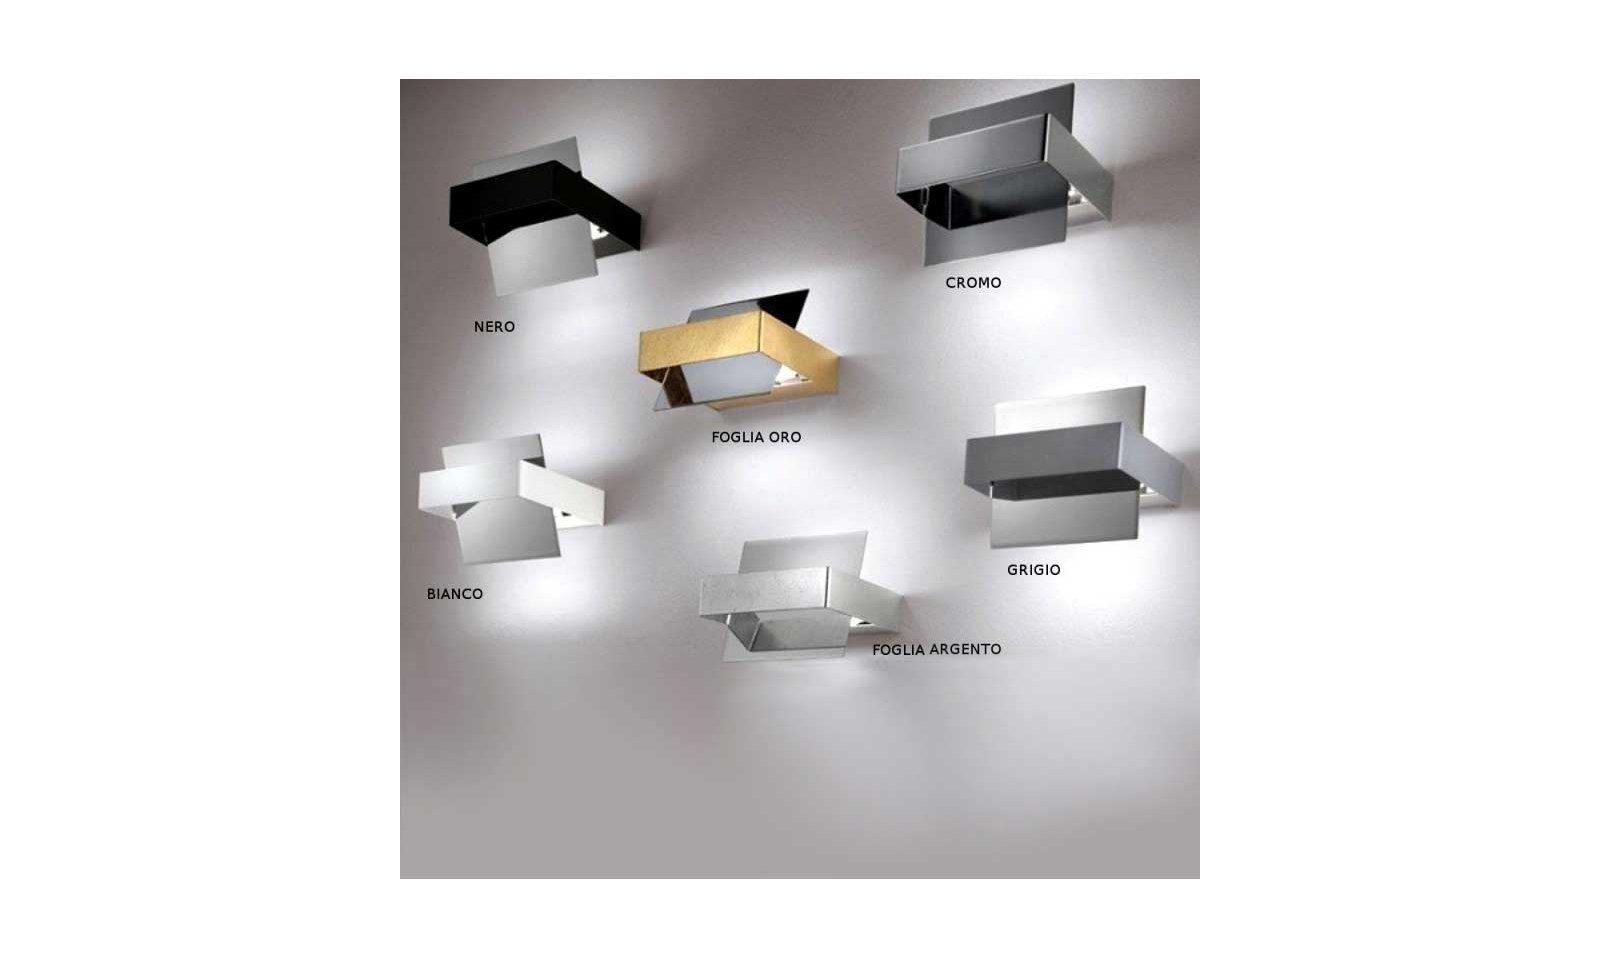 Braga beleuchtung led wandlecuhte volta moderne led lampe